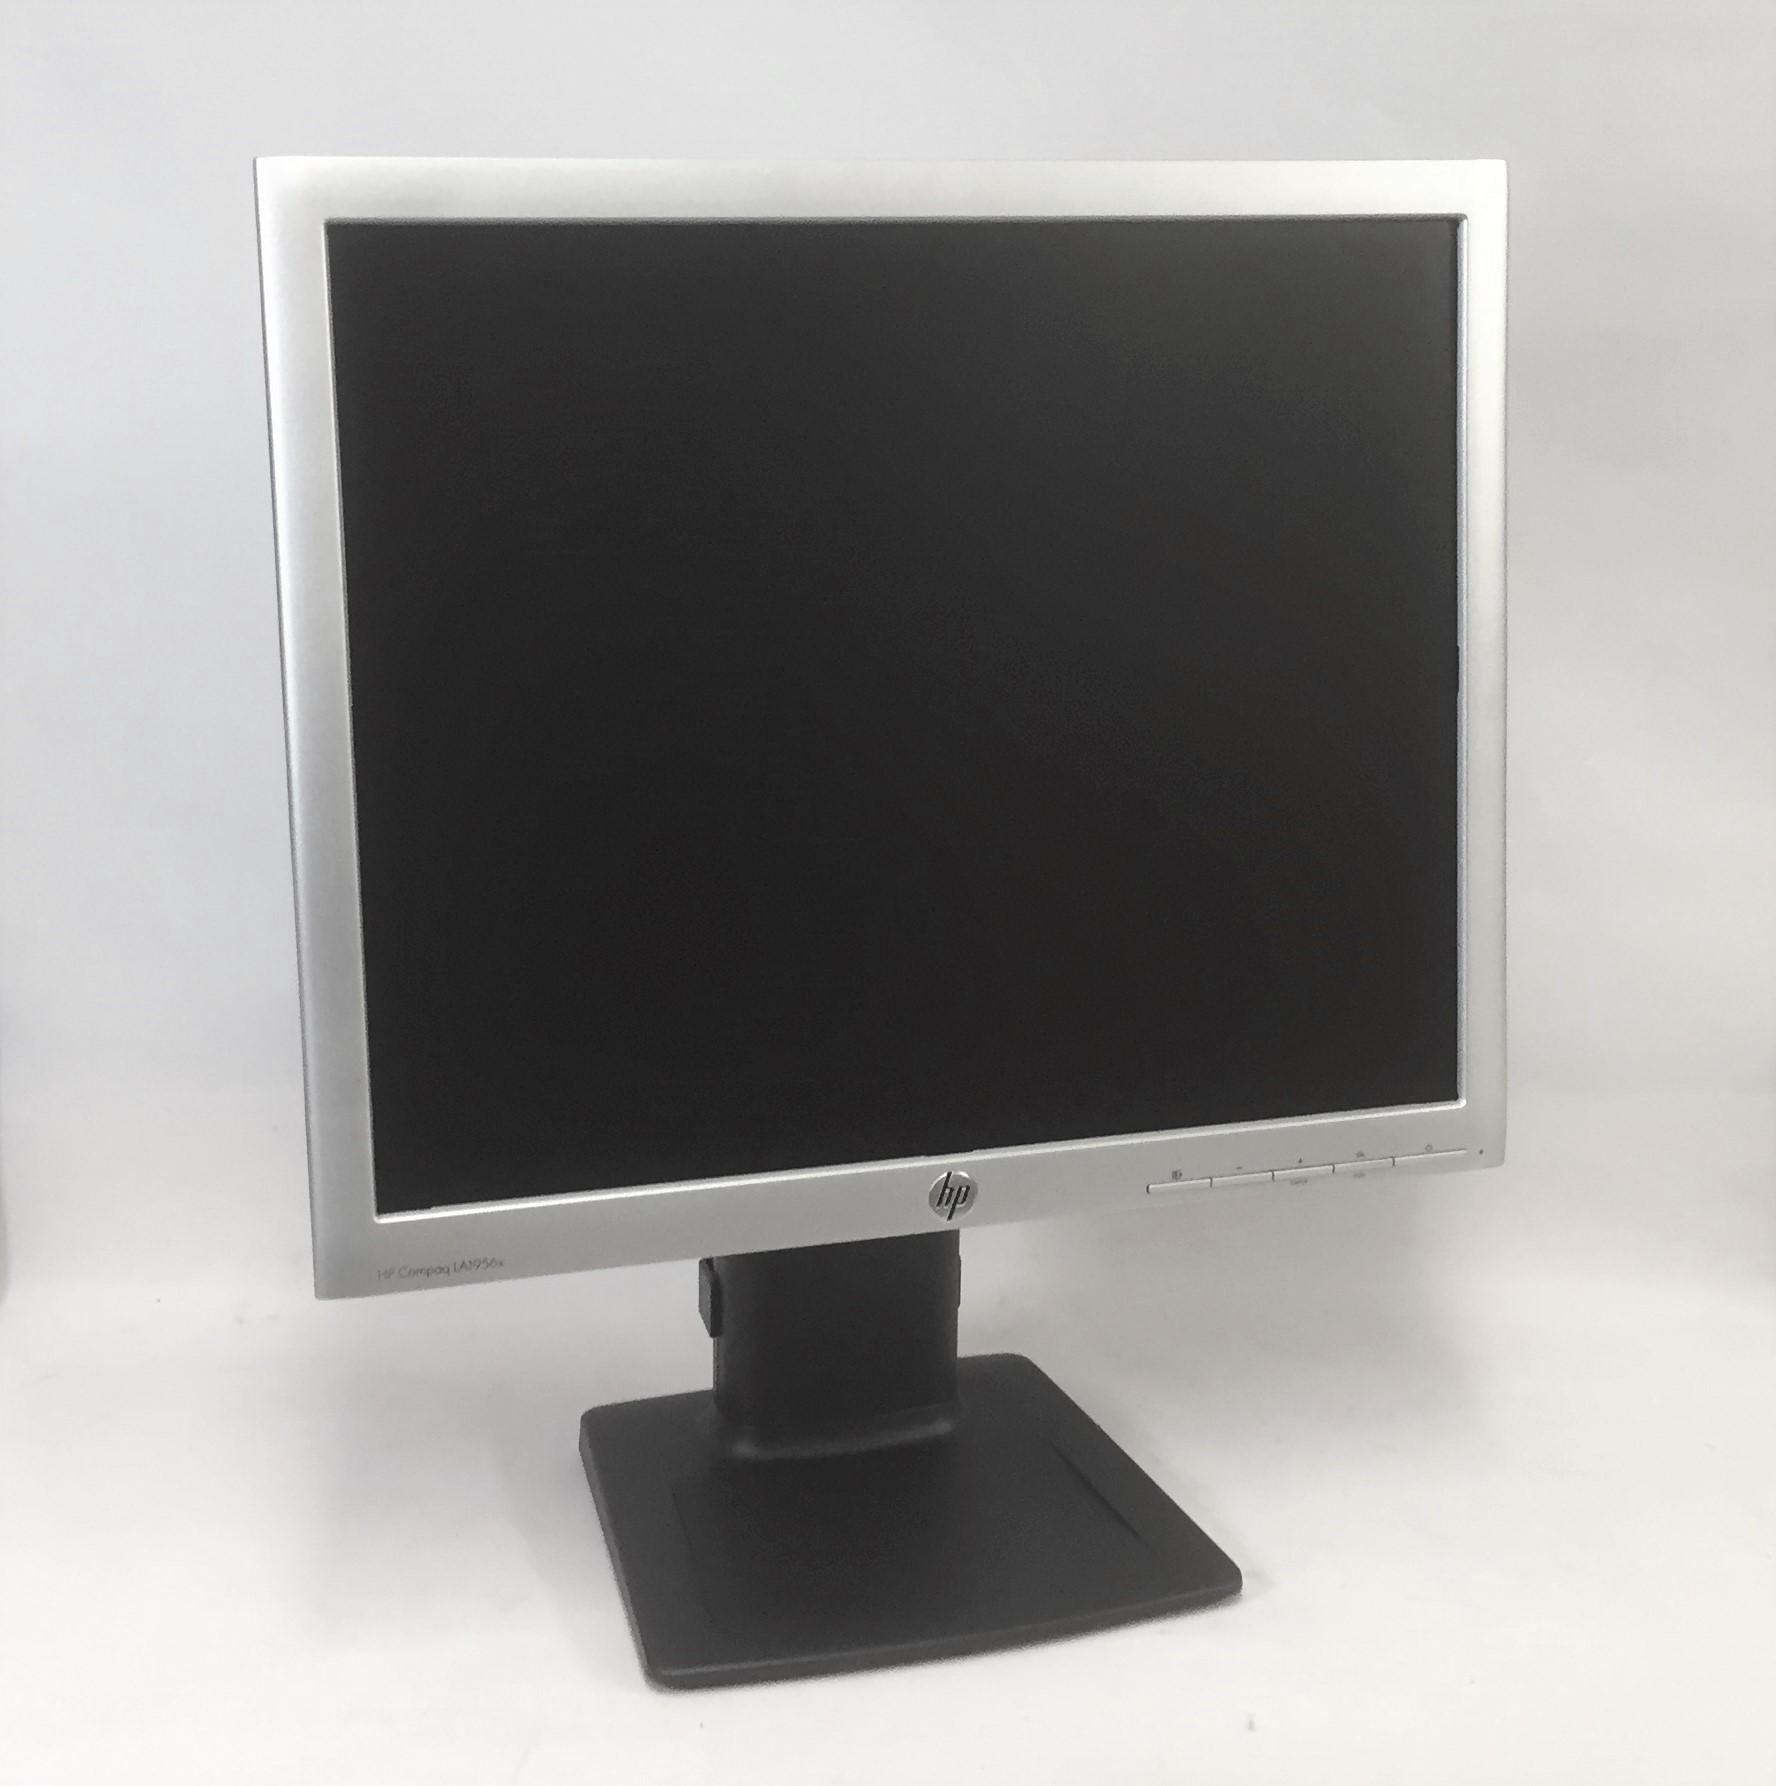 HP-LA1956x - 148344